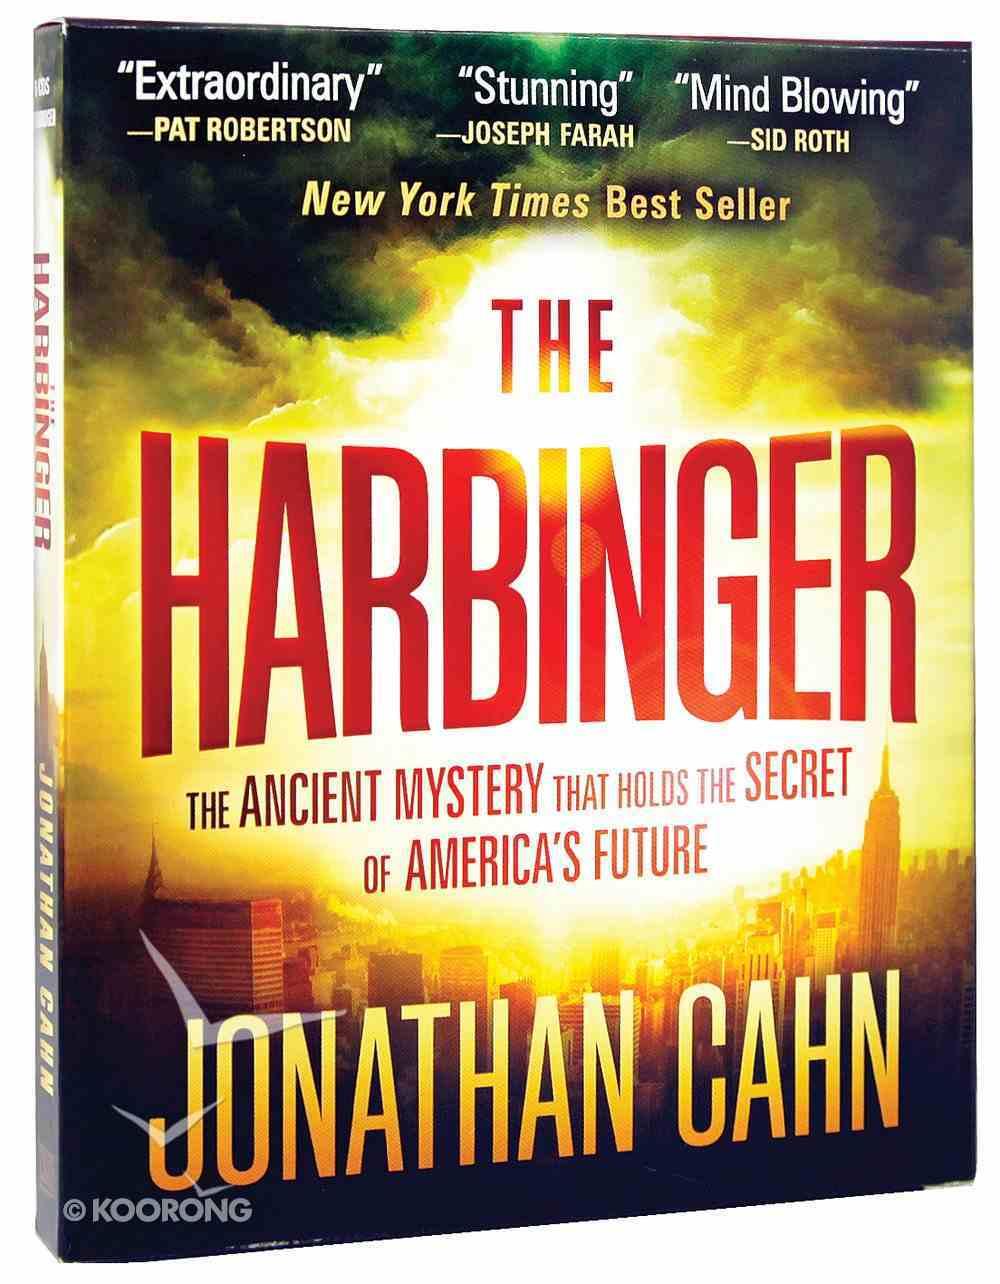 The Harbinger (6 Cds Unabridged) CD